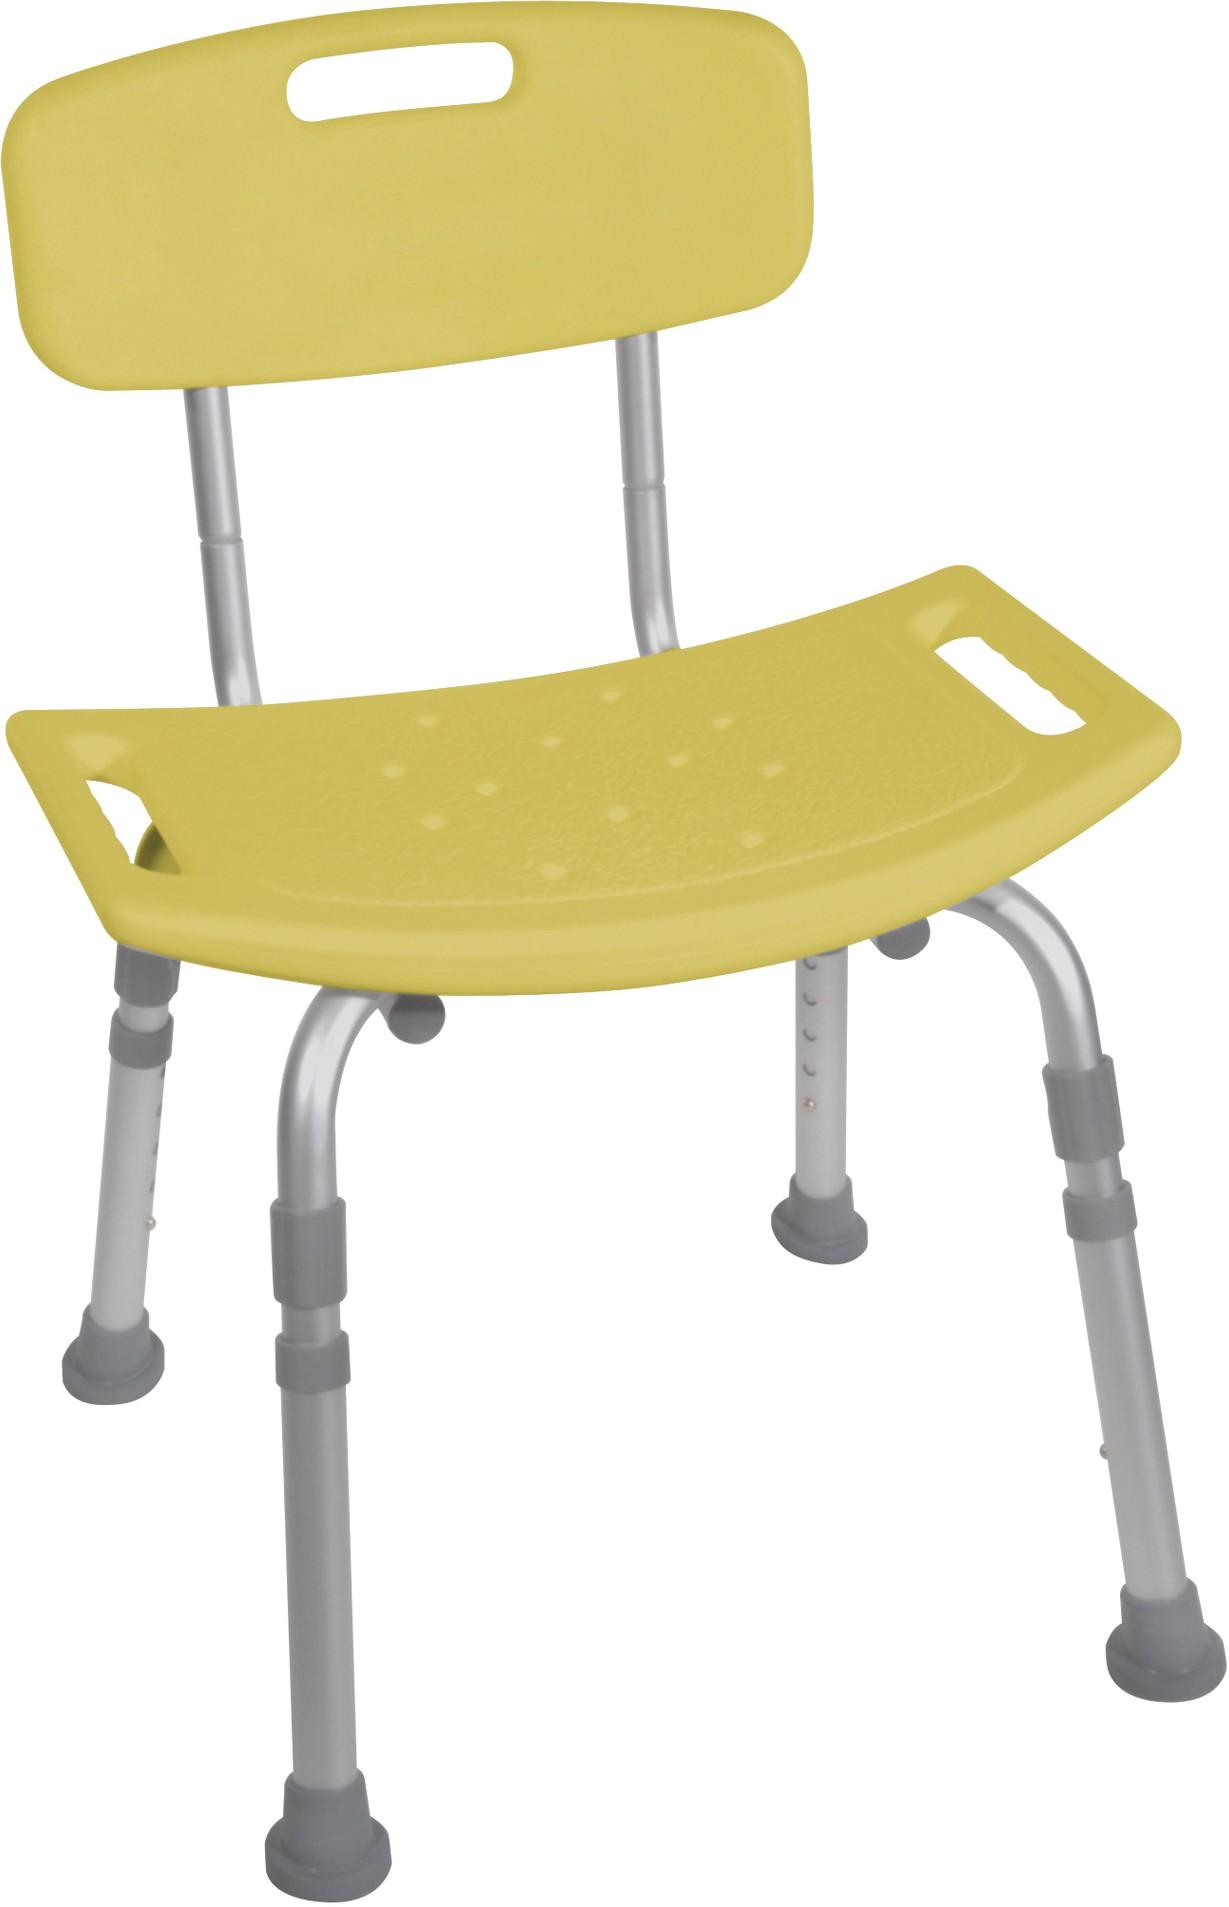 bathroom_safety_shower_tub_bench_chair_yellow.jpg